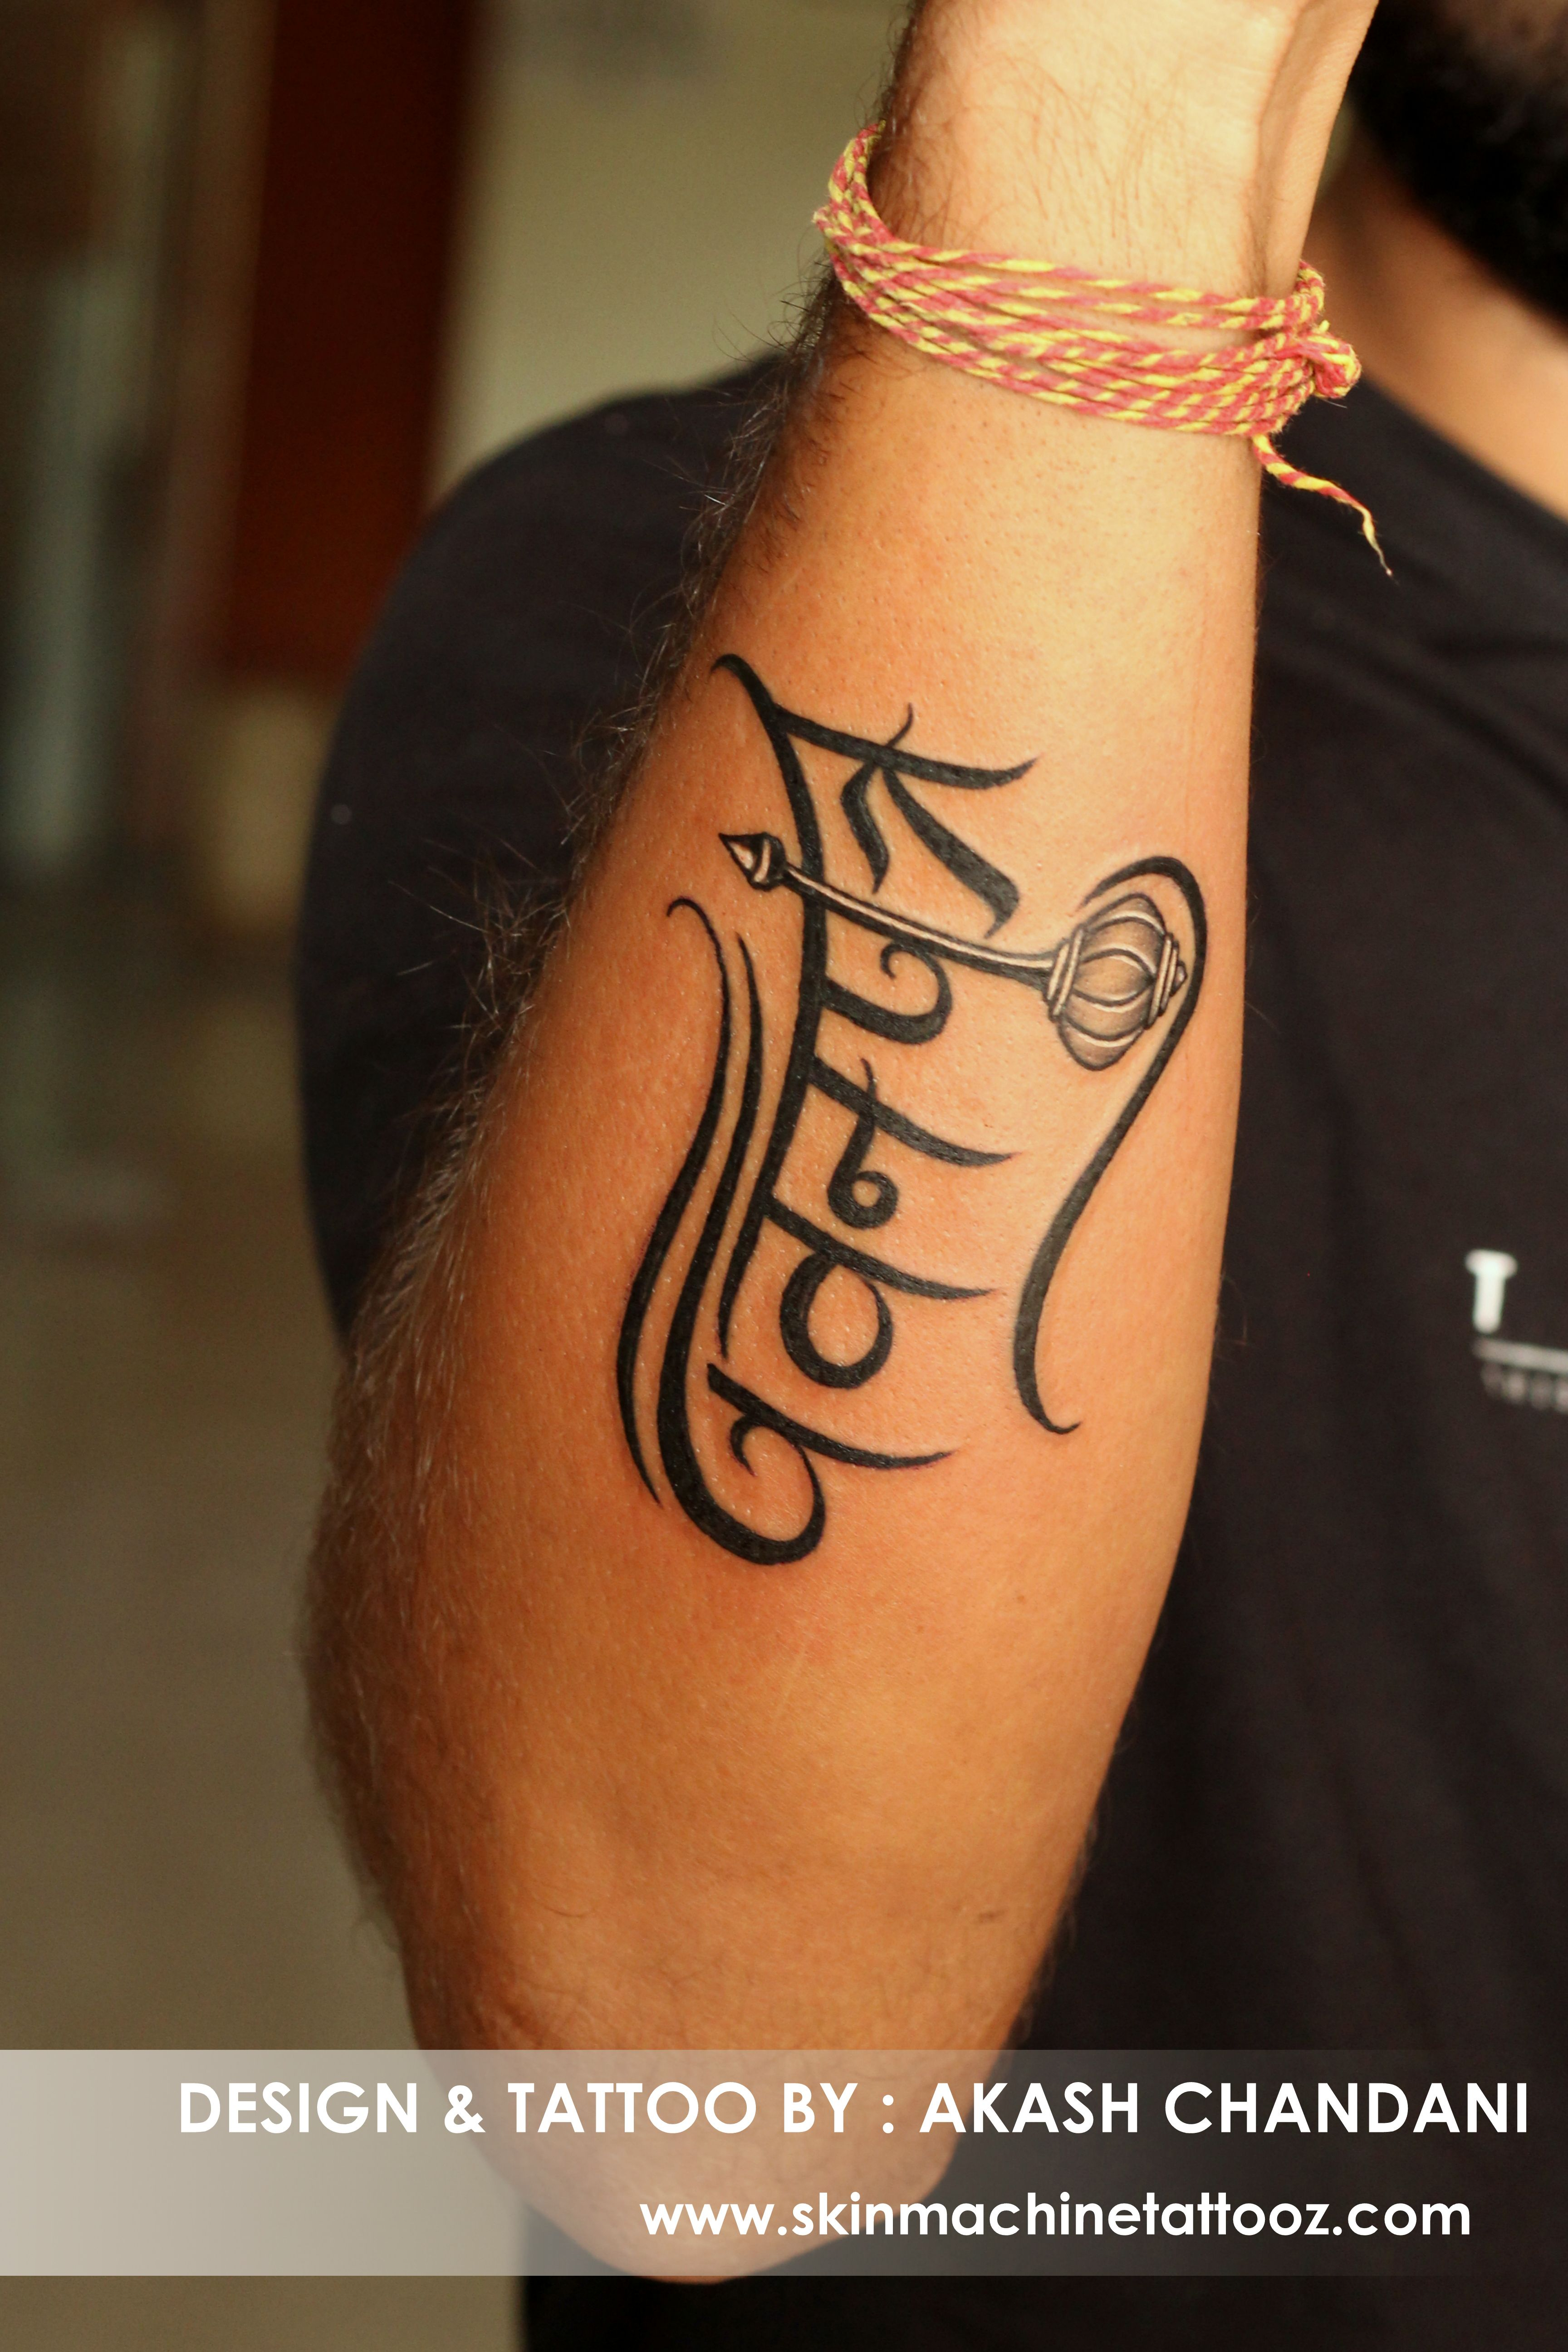 Pavanputra A Name Of Lord Hanuman Design And Tattoo By Akash Chandani Skin Machine Tattoo Studio Bhopal India Emai Hanuman Tattoo Tattoos Hindu Tattoos